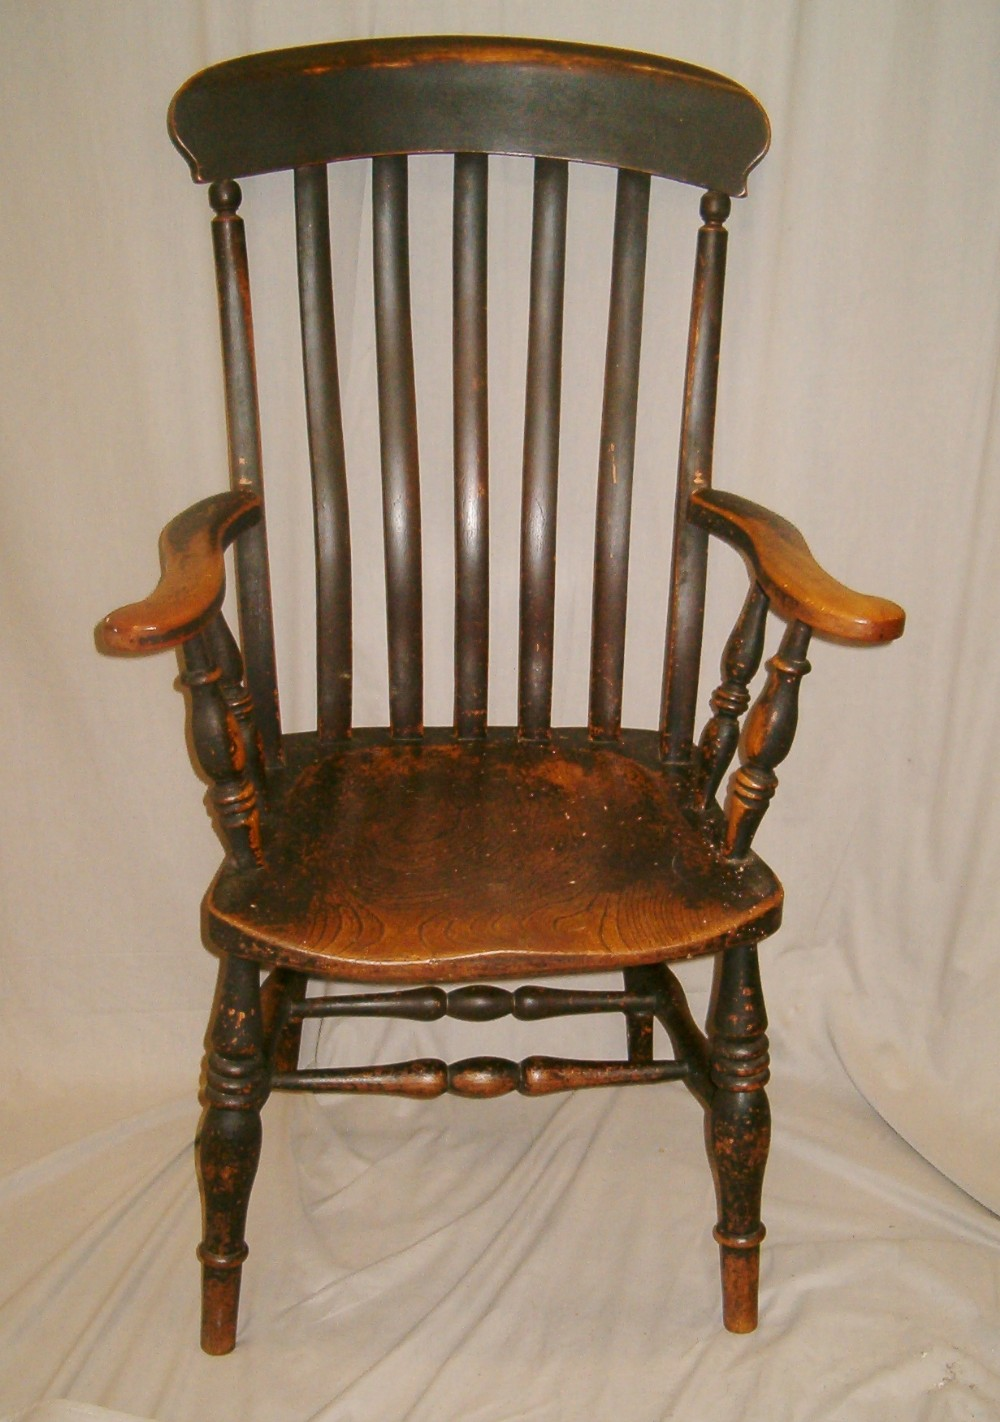 Antique Windsor Chair  255517  Sellingantiques.co.uk